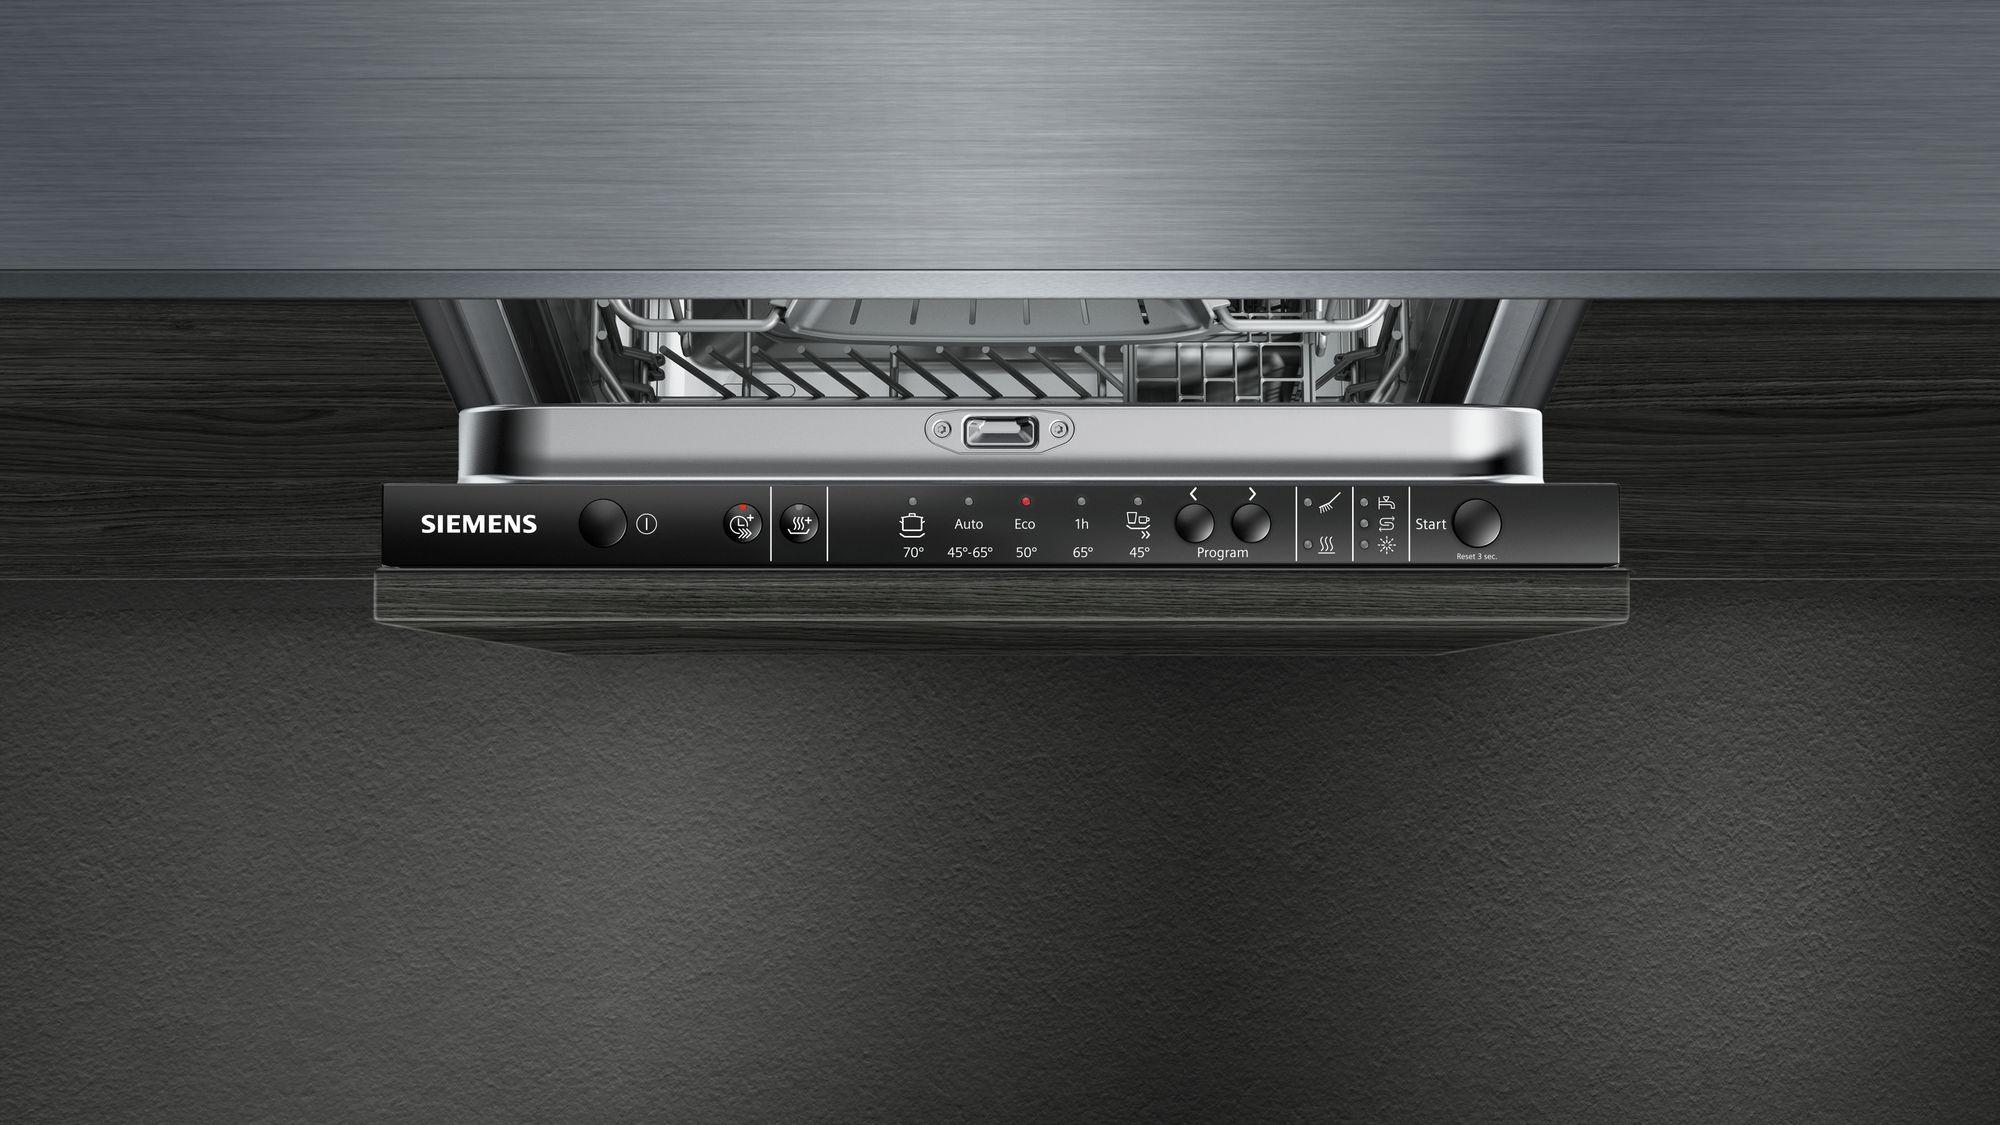 Siemens Kühlschrank 45 Cm Breit : Siemens geschirrspüler cm speedmatic iq sr ce psi